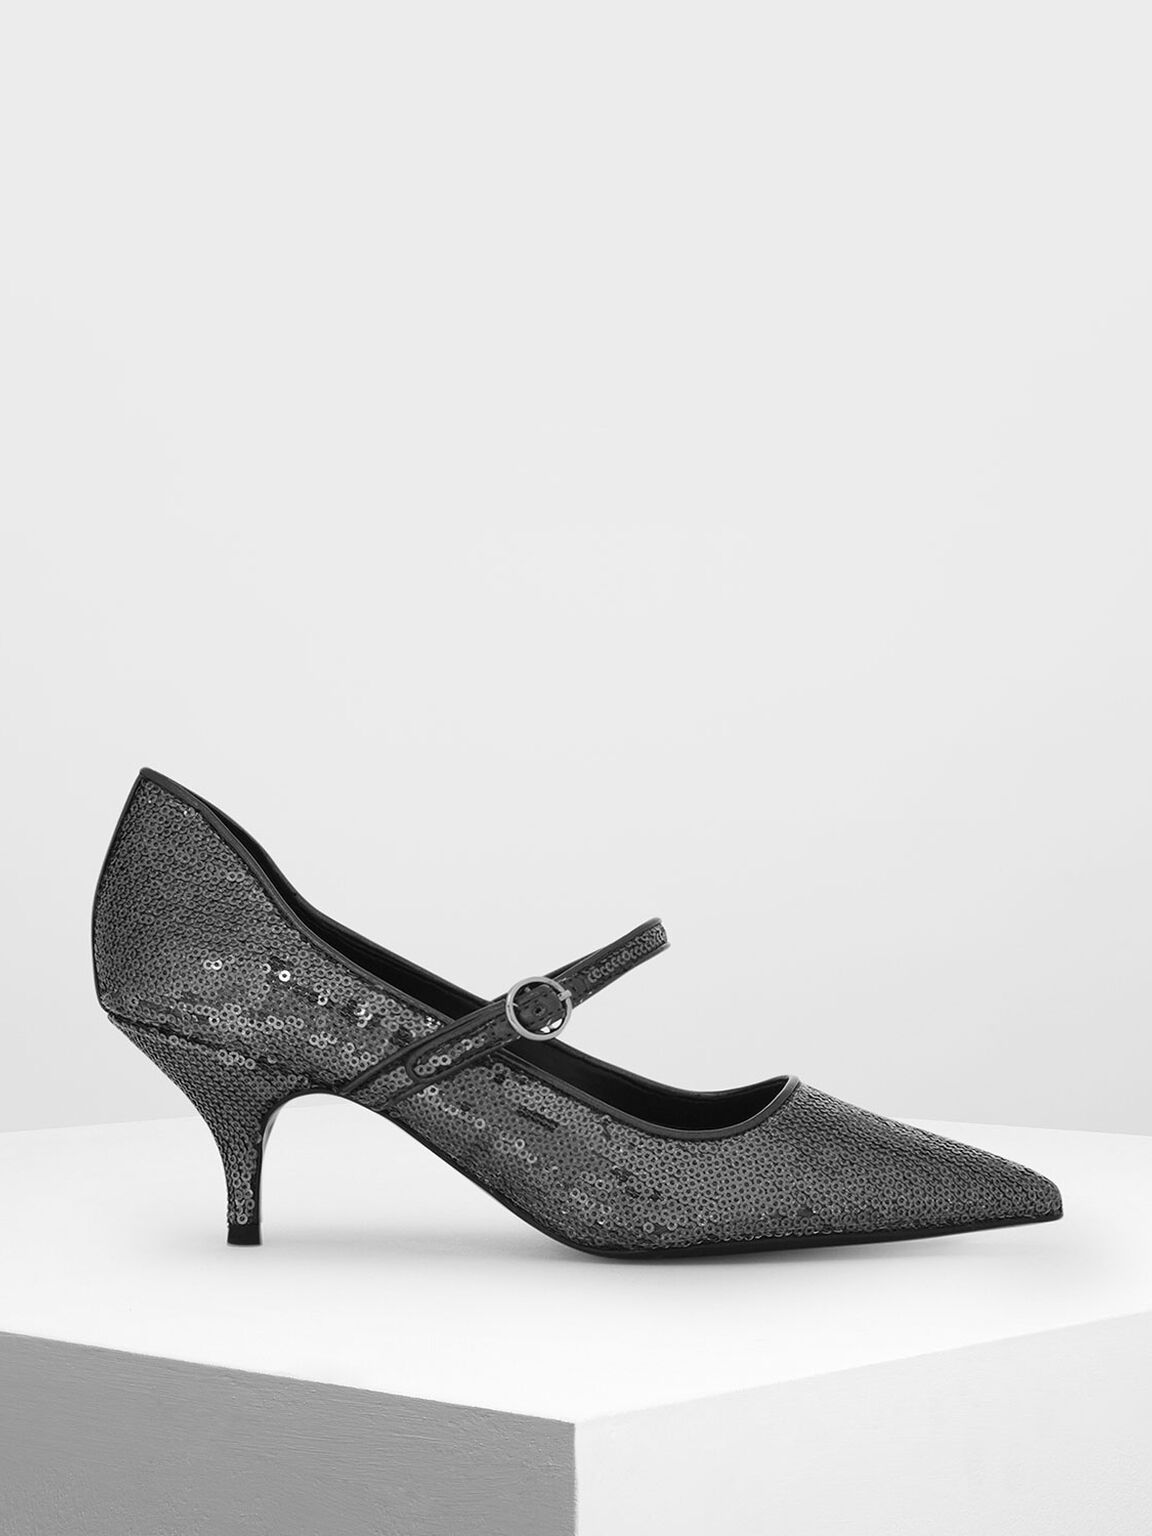 Sequin Detail Mary Jane Heels, Pewter, hi-res